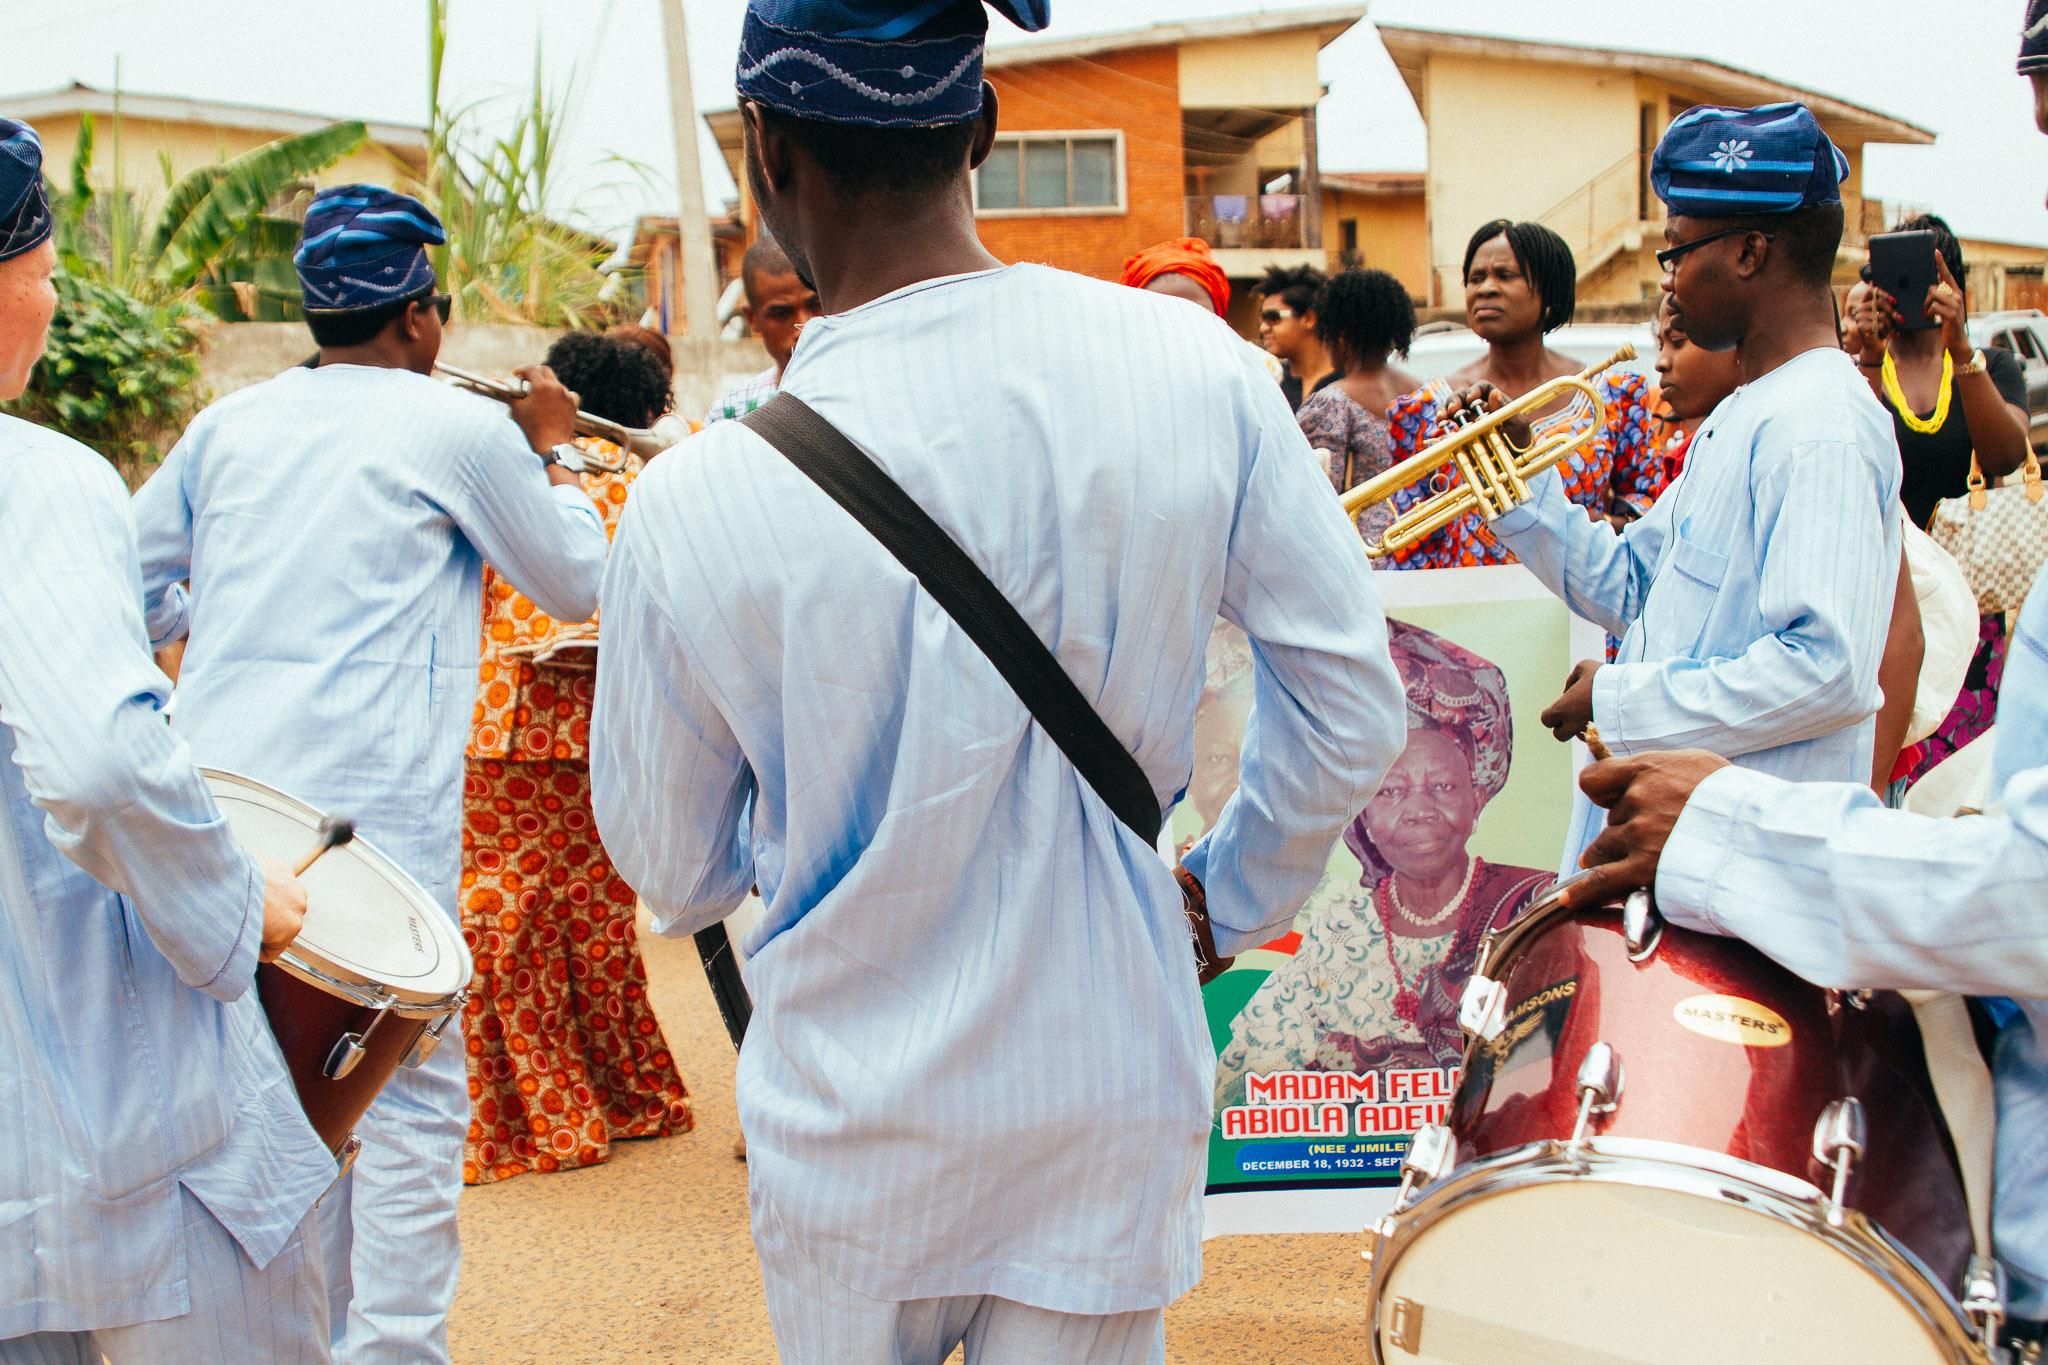 nigeria_lesleyade photography-7.jpg